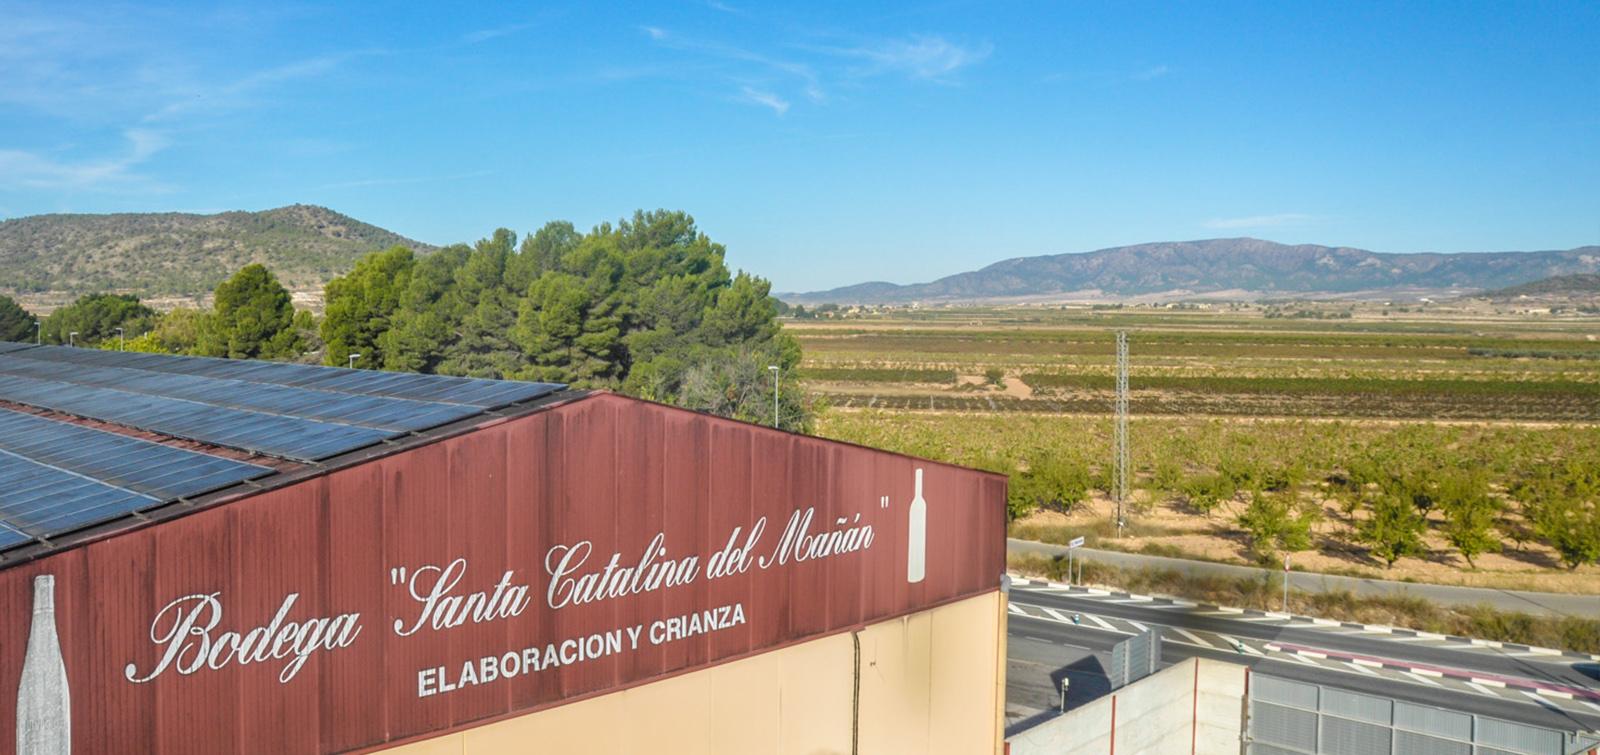 Bodega Santa Catalina del Mañán - BECKERPINA